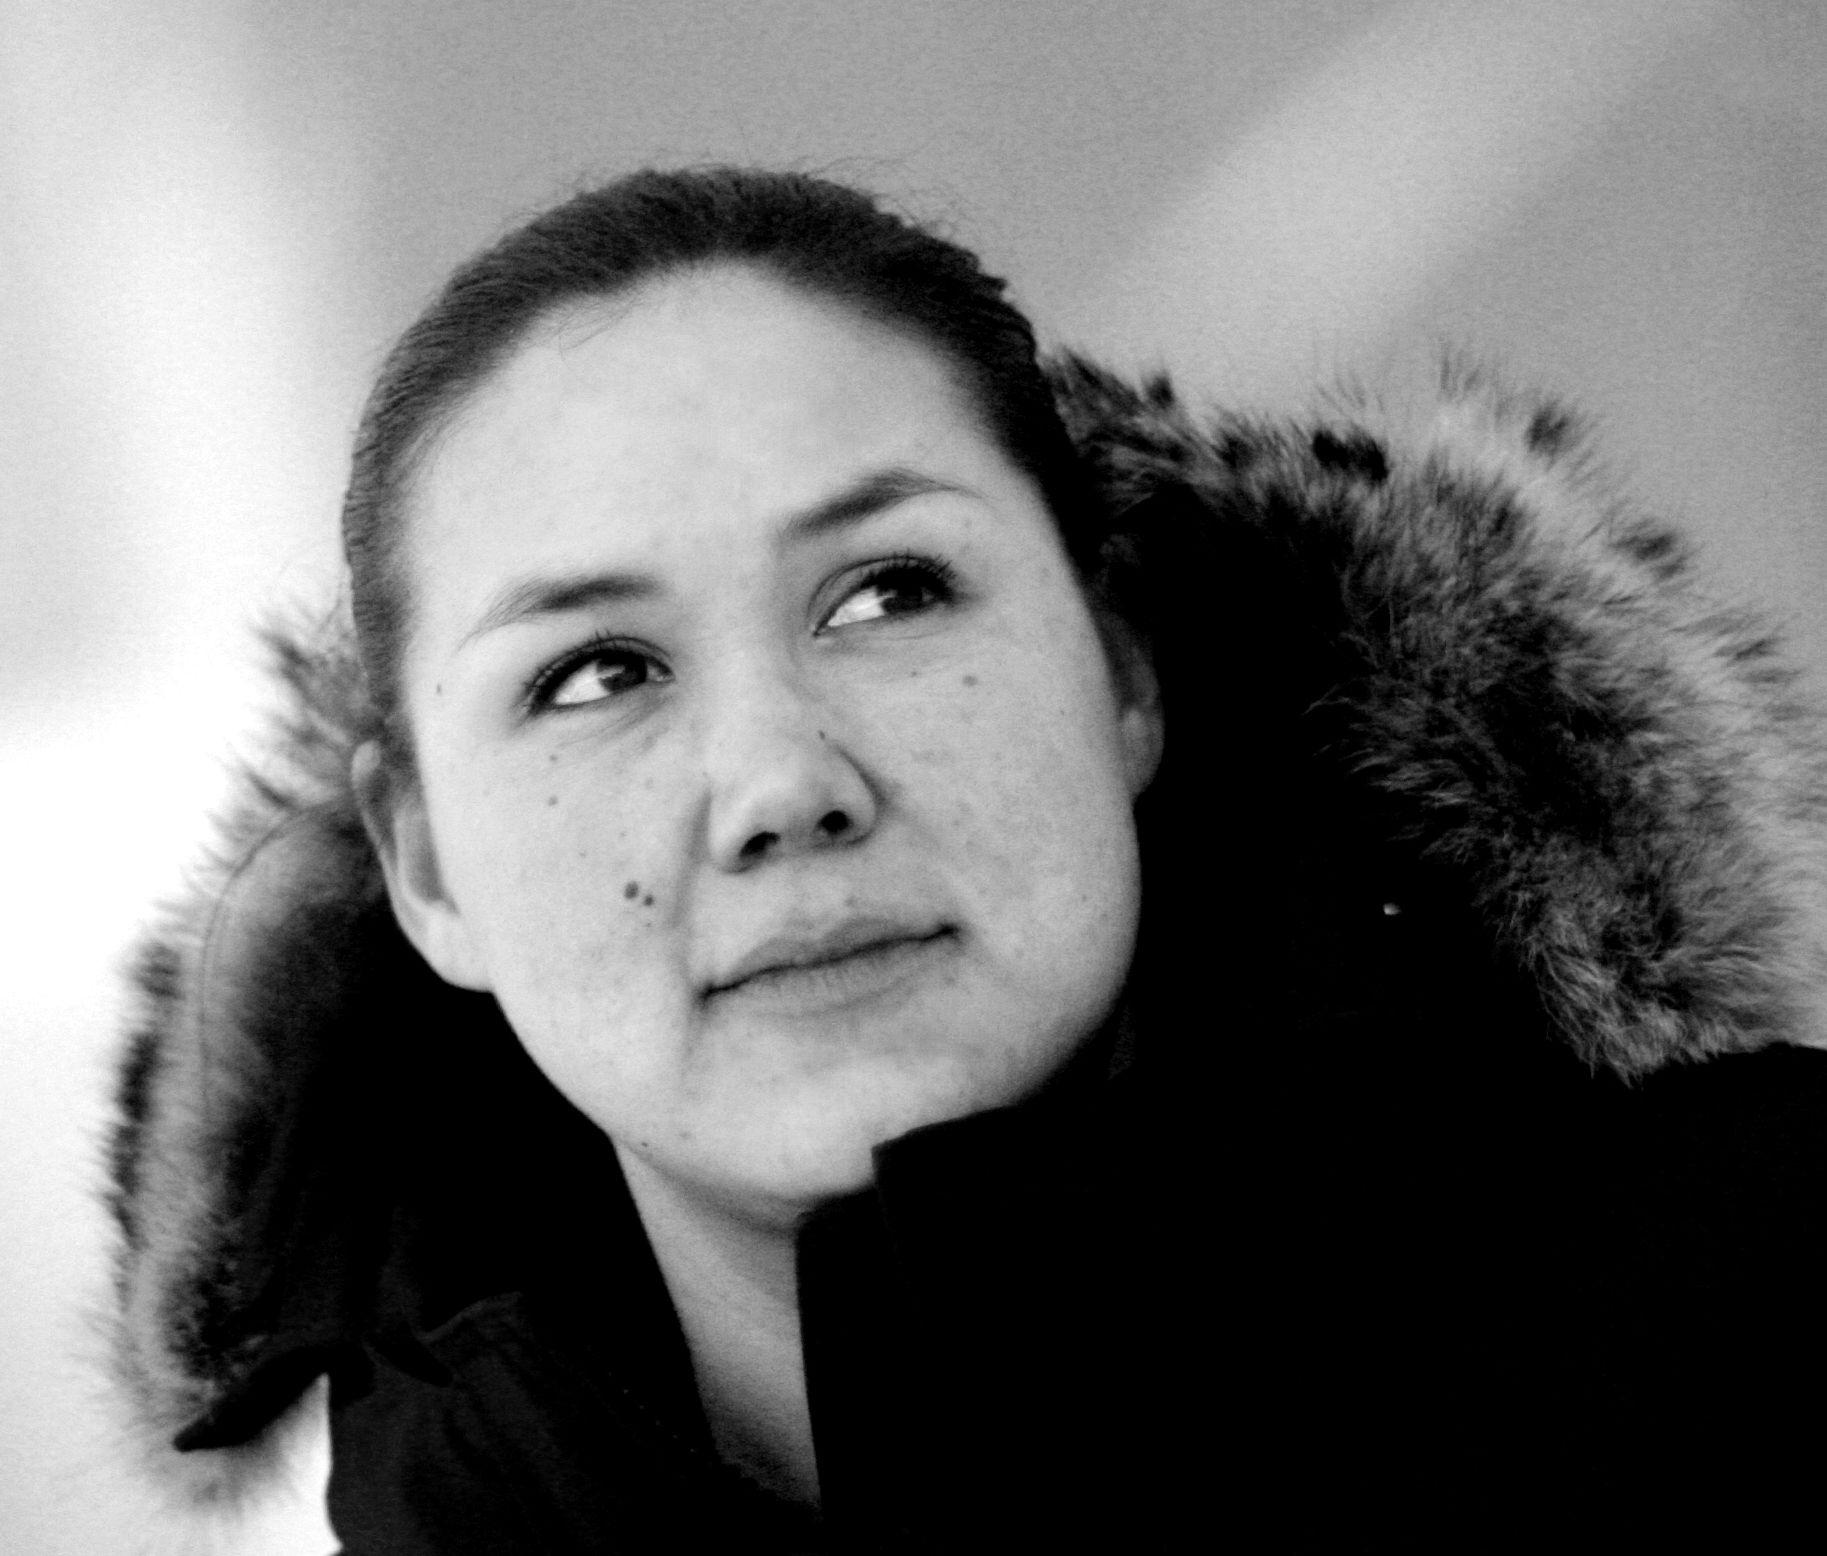 Niviaq Korneliussenová